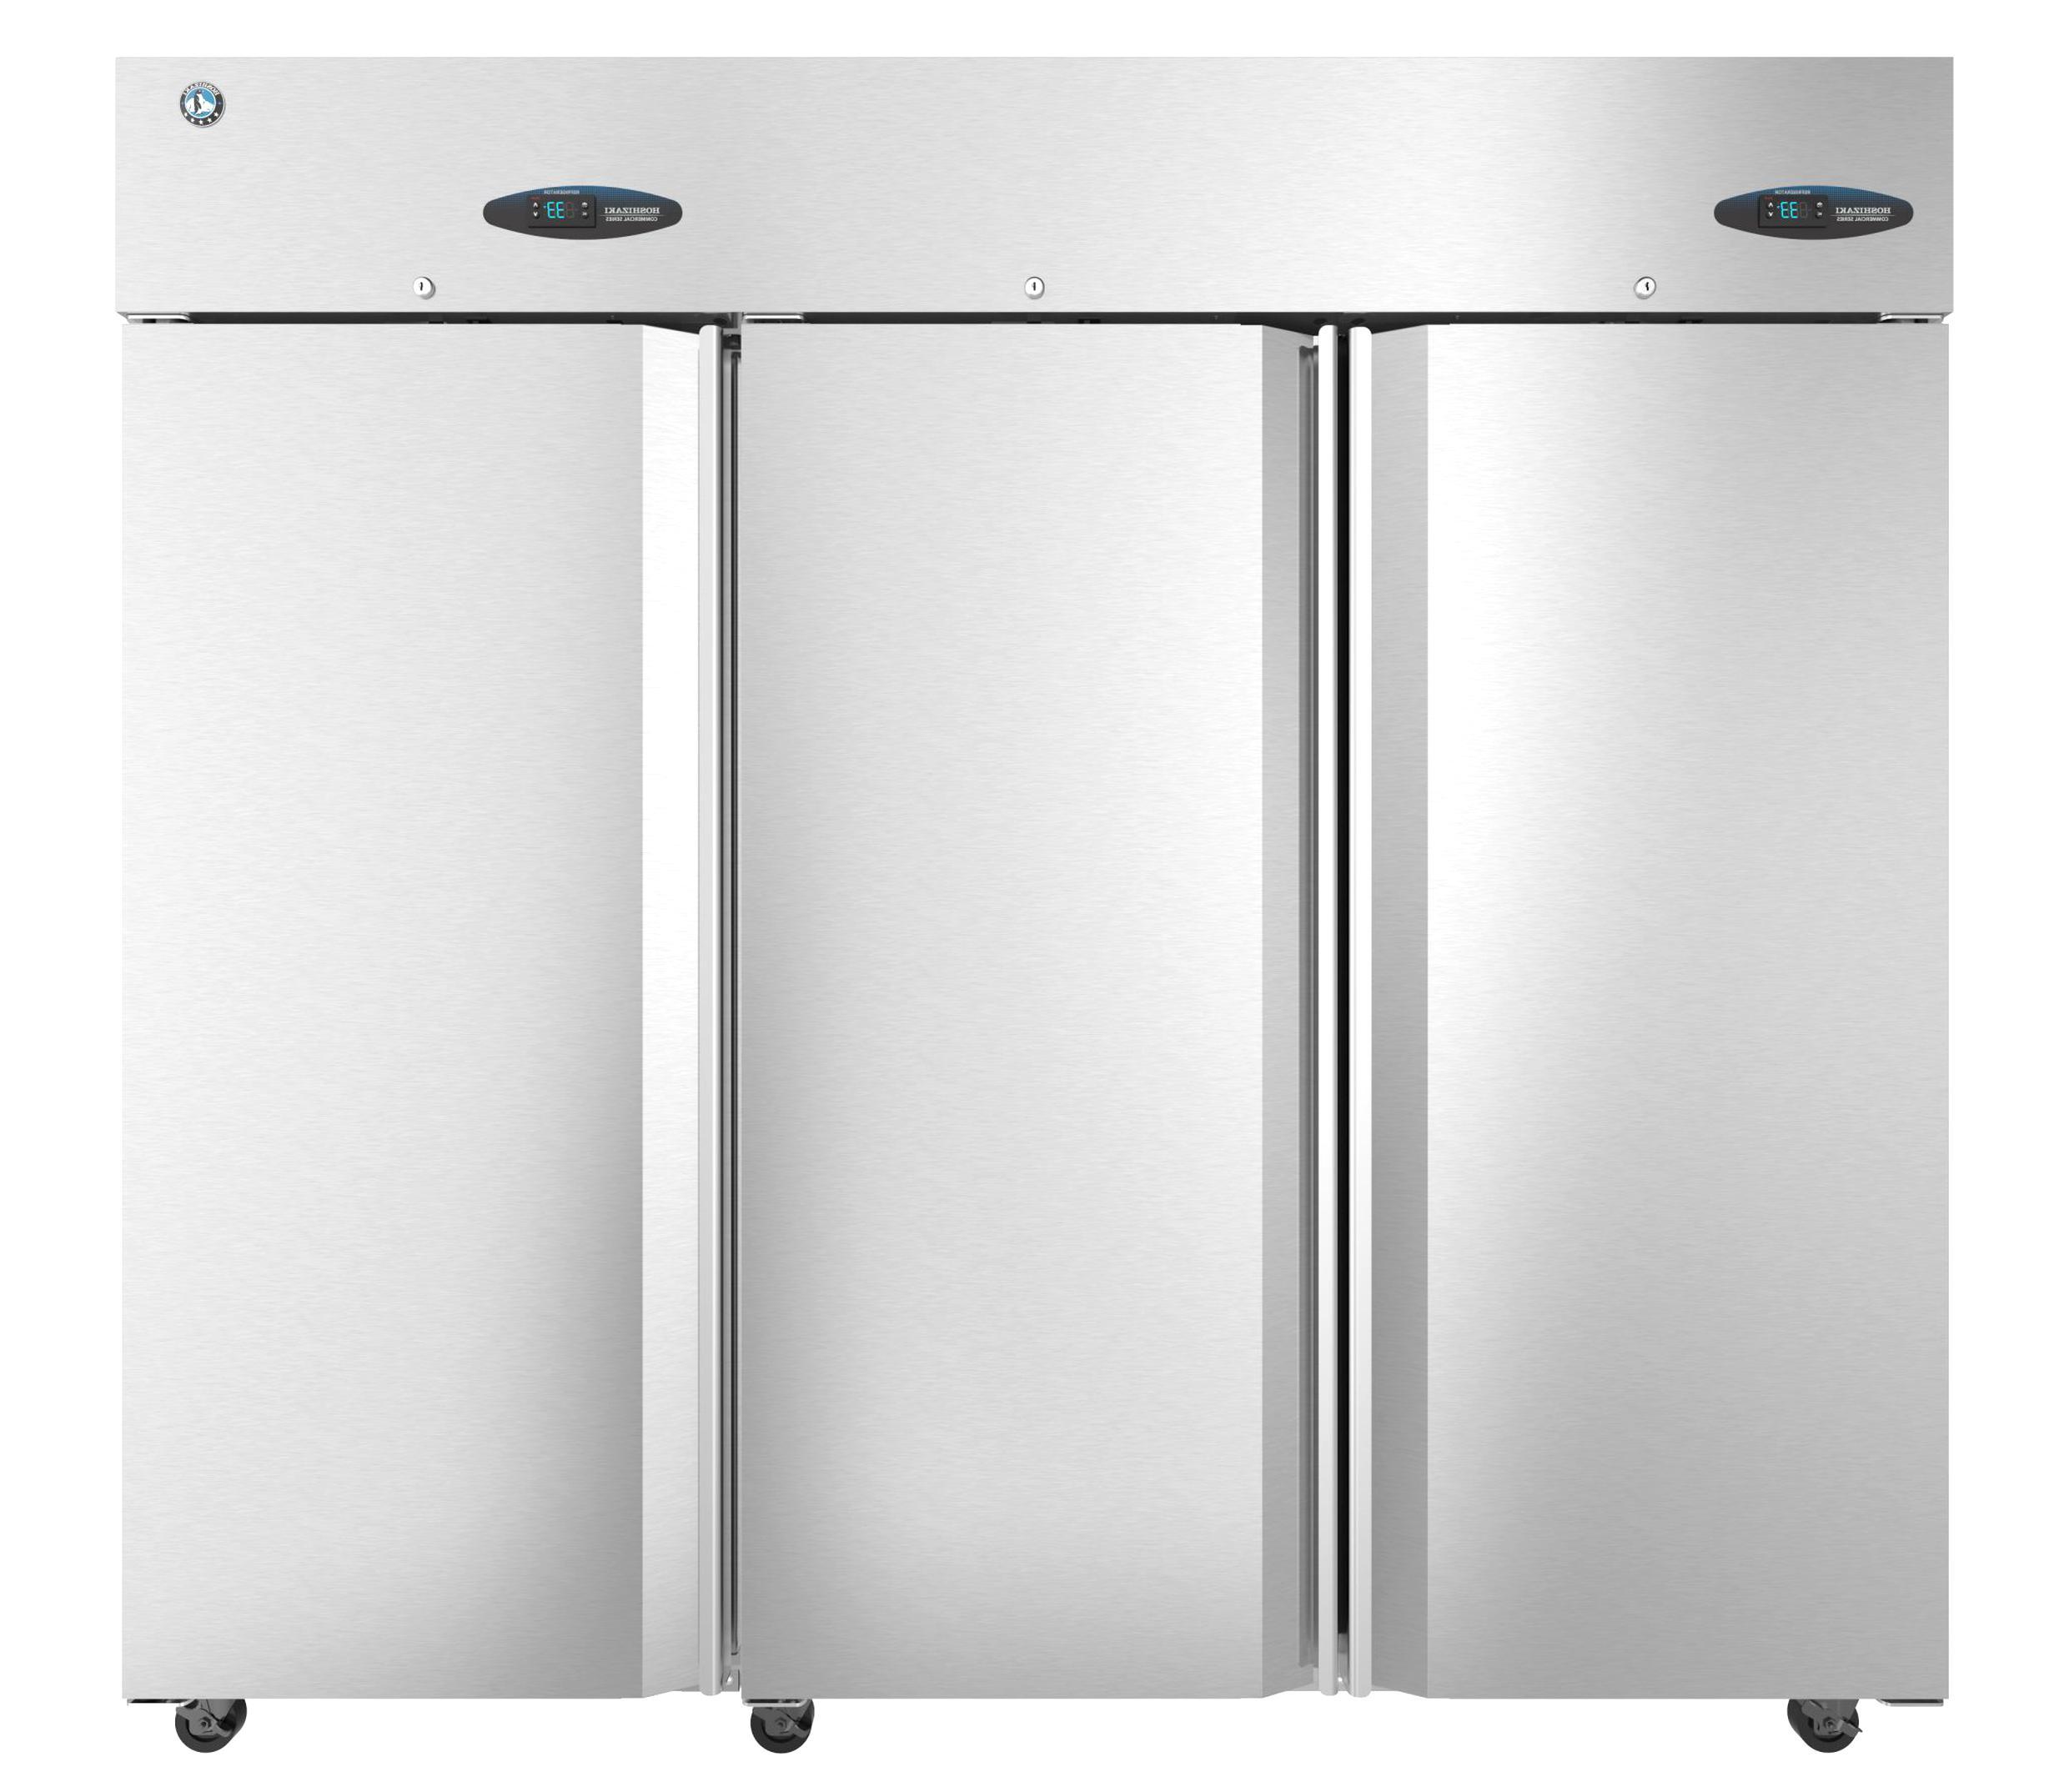 fridge freezer hoshizaki for sale